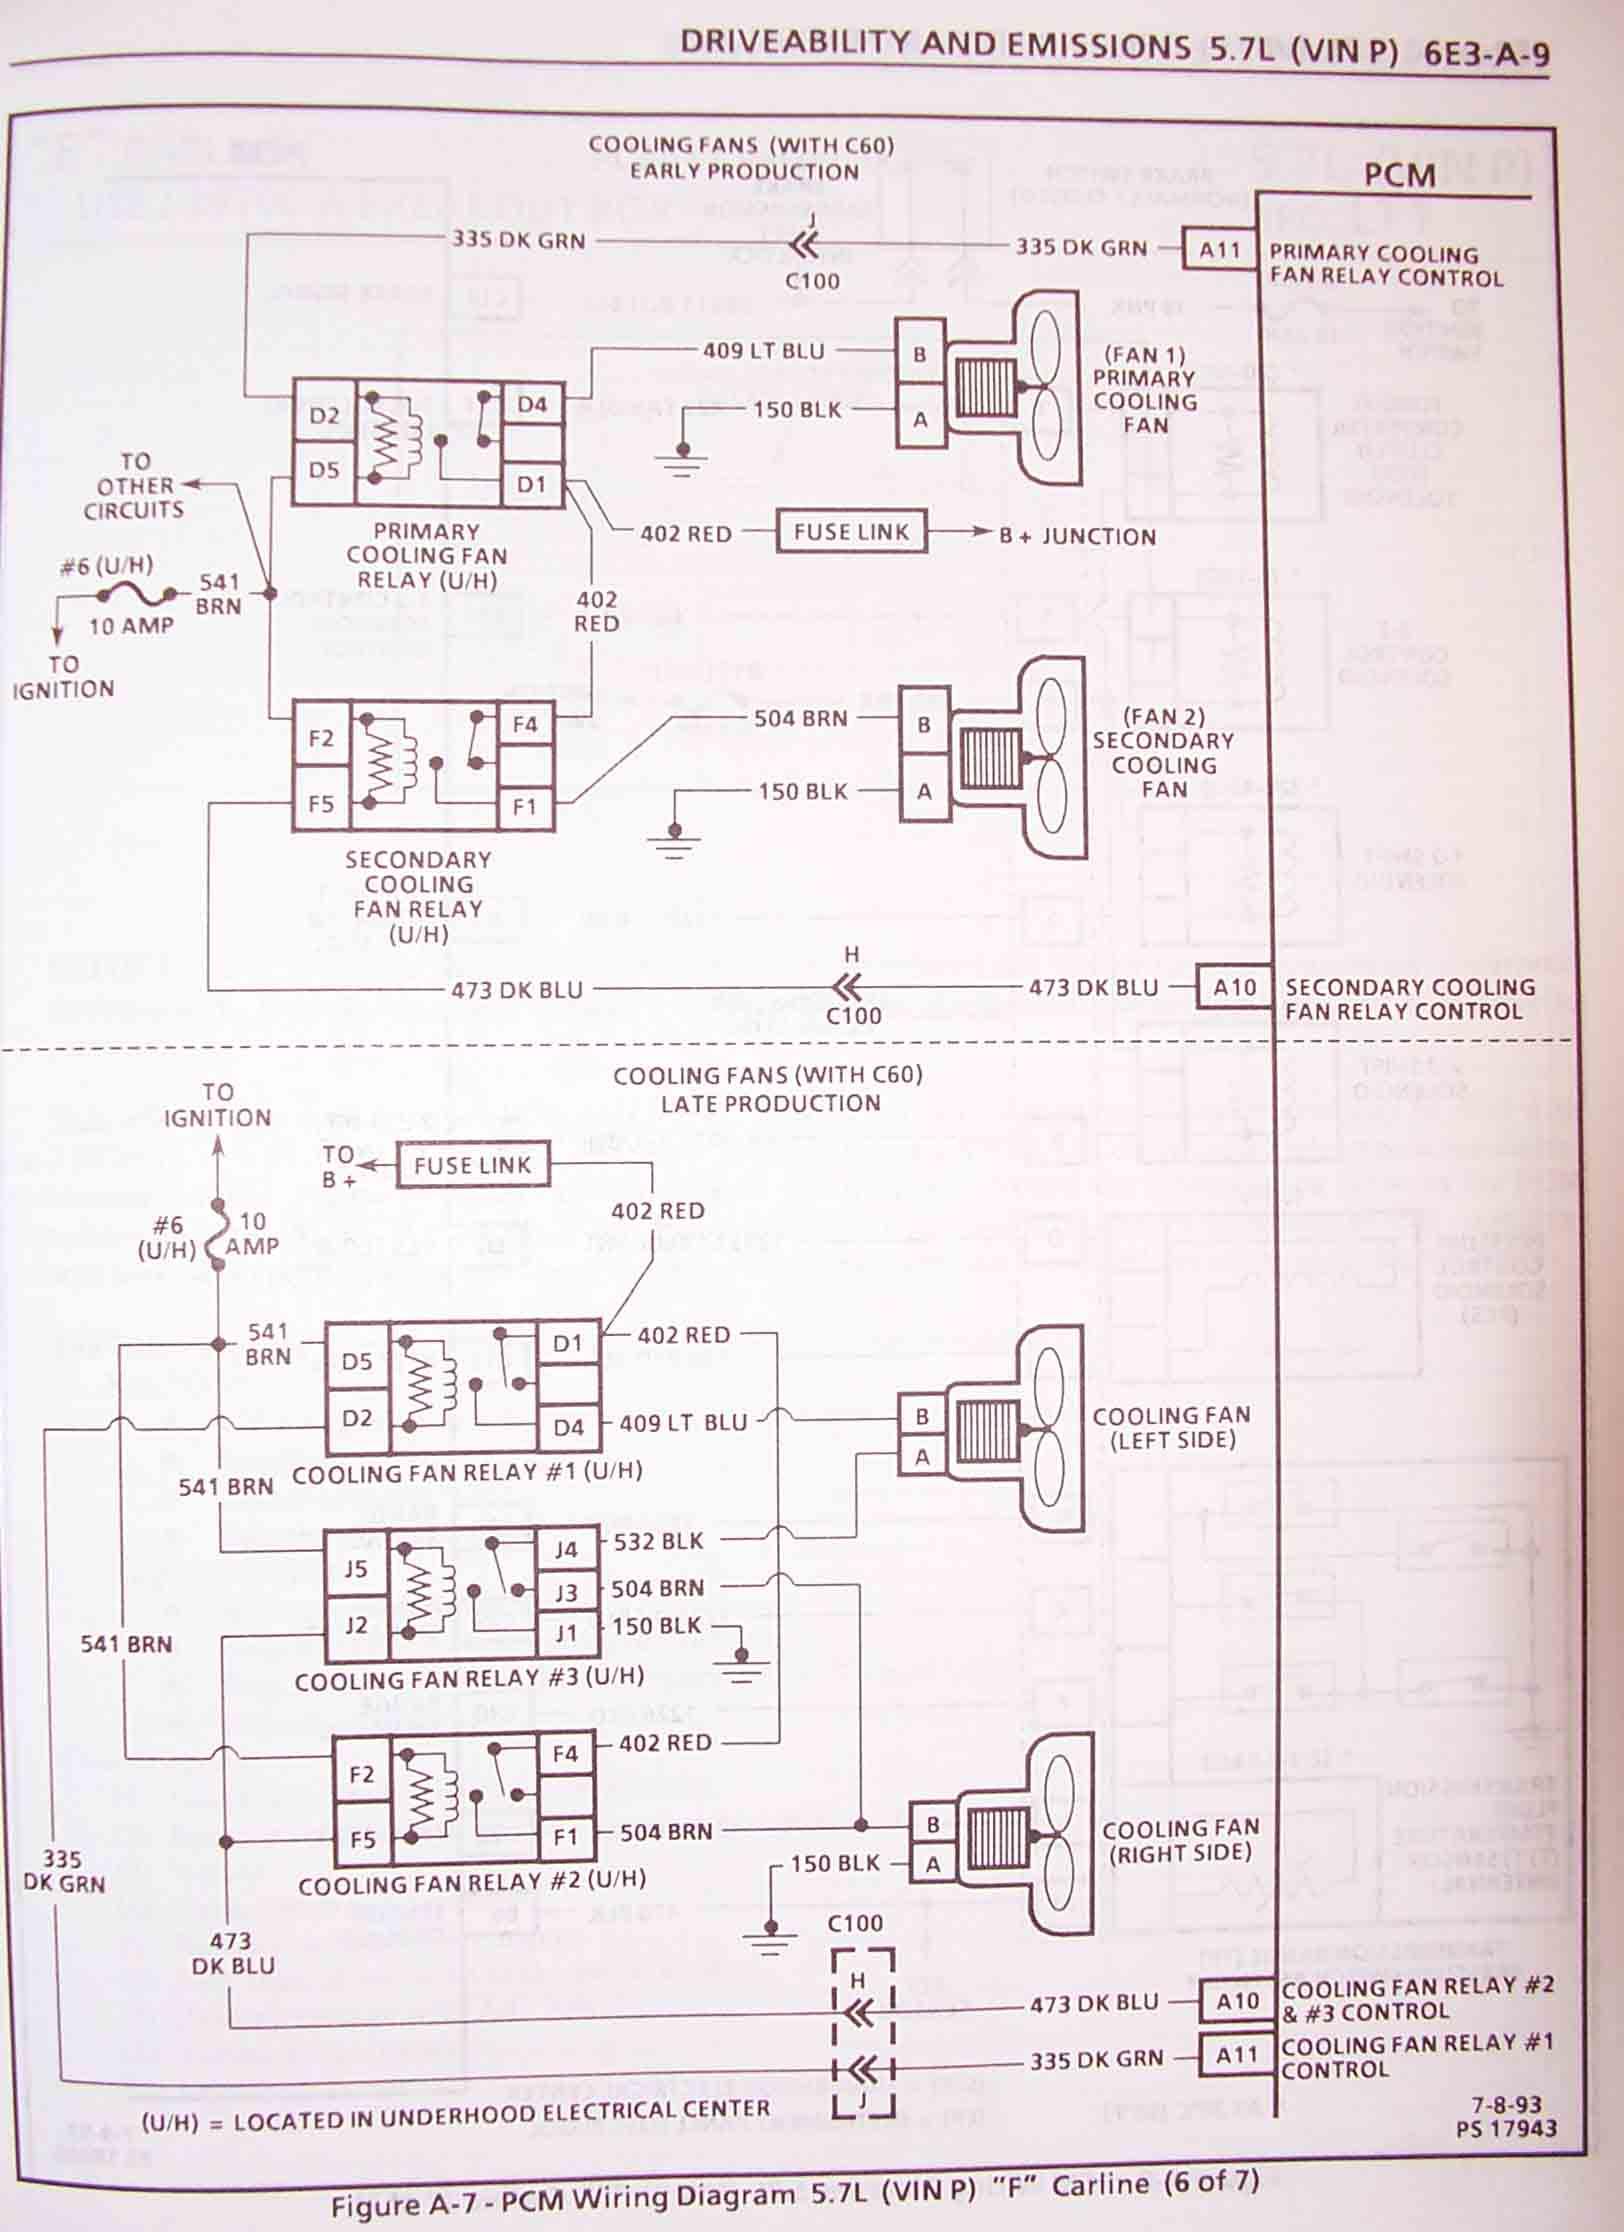 1995 F Body Wire Harness Schematics